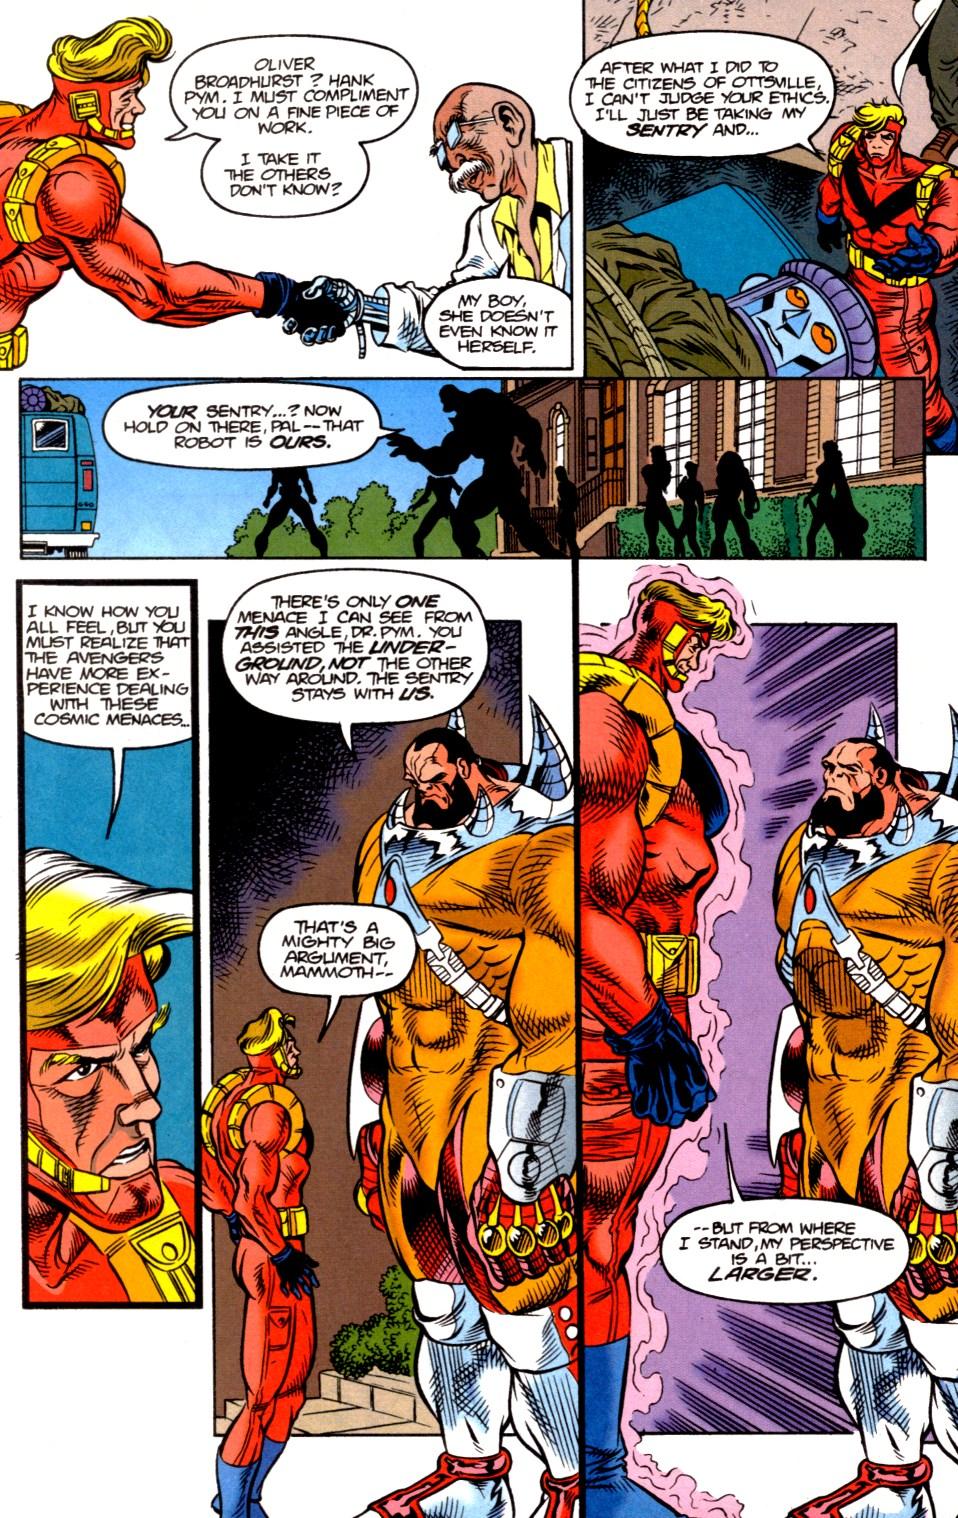 Read online Blackwulf comic -  Issue #6 - 5